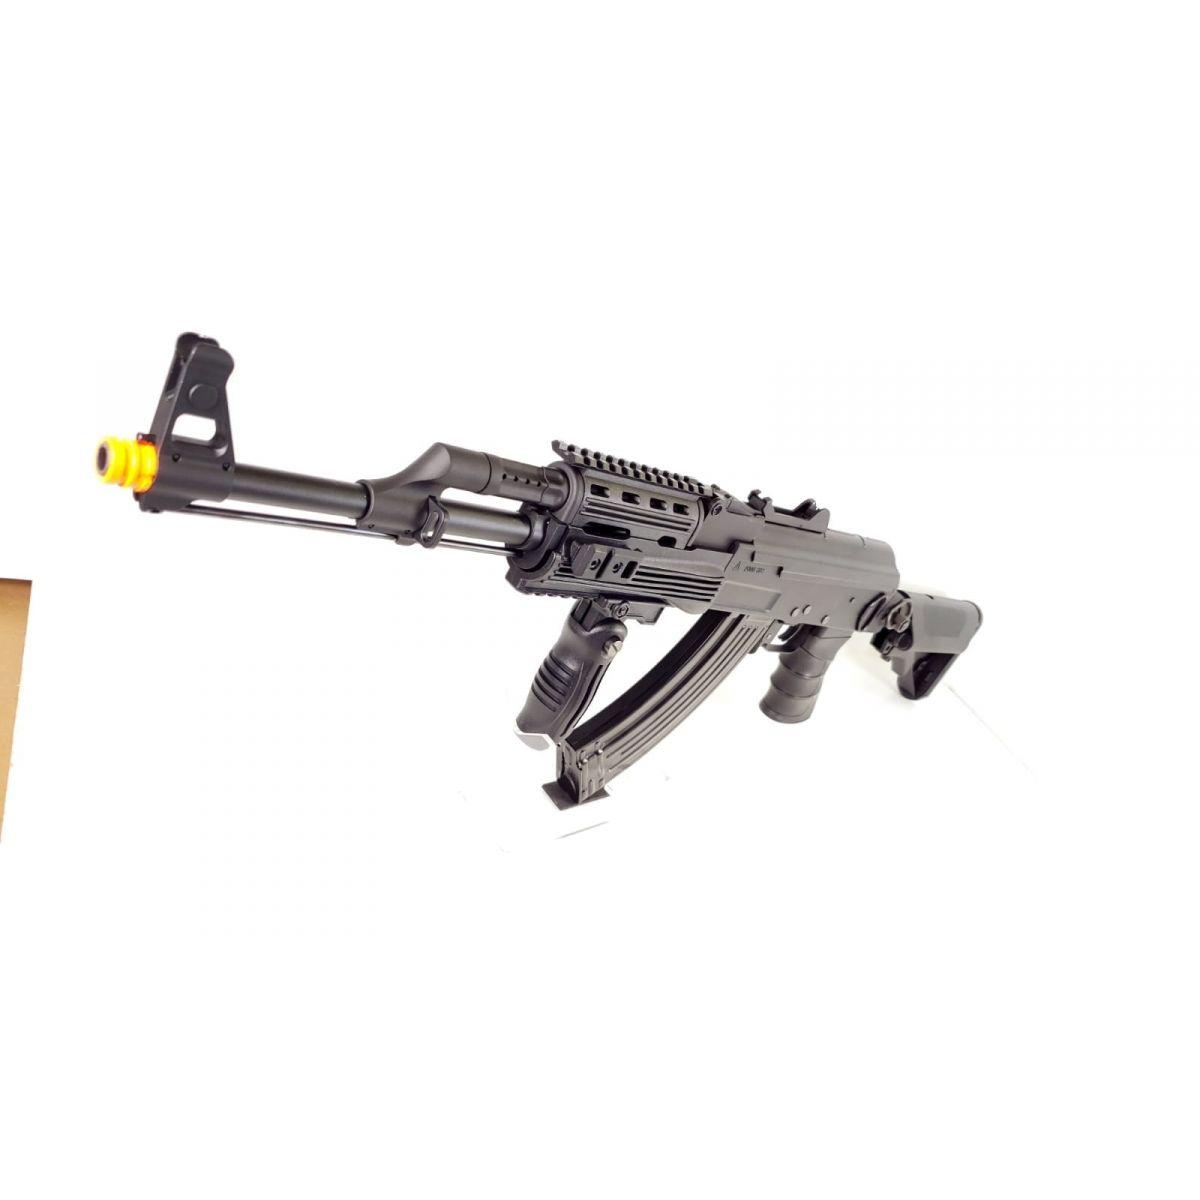 SR-TAC FULL METAL AK47 AEG Electric Airsoft Rifle ARMY